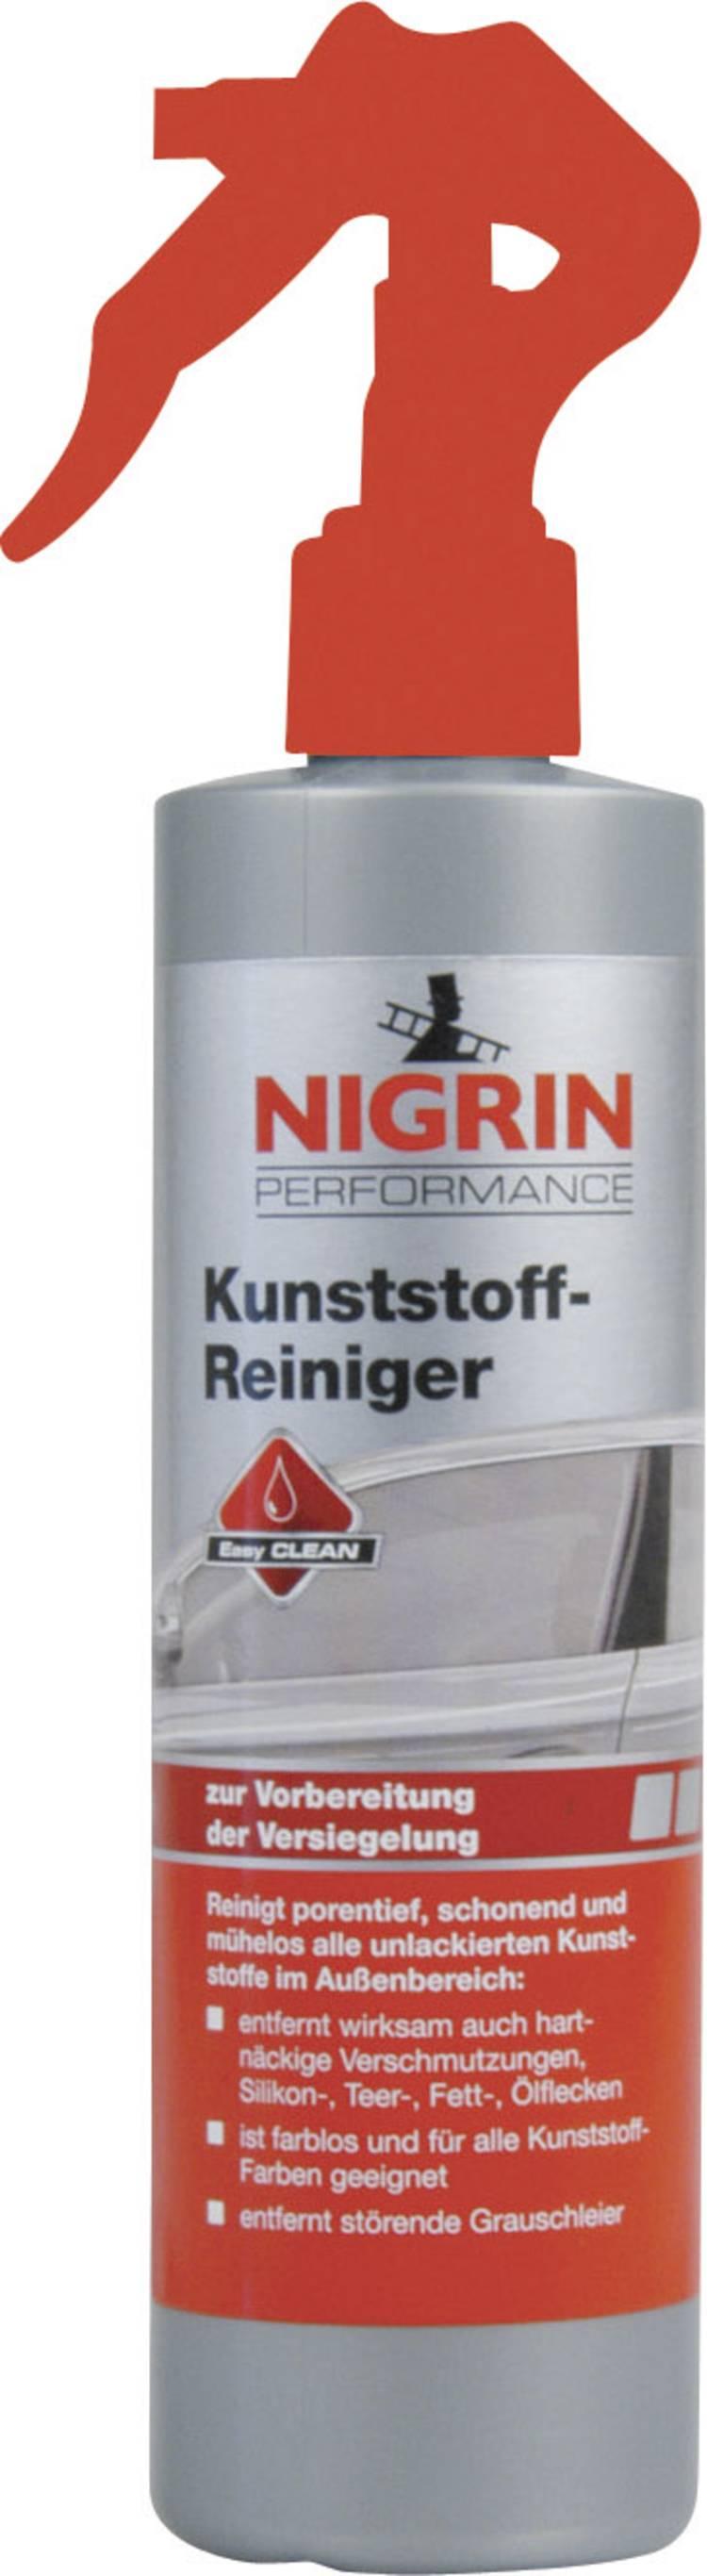 Image of Kunststofreiniger 300 ml Nigrin 72935